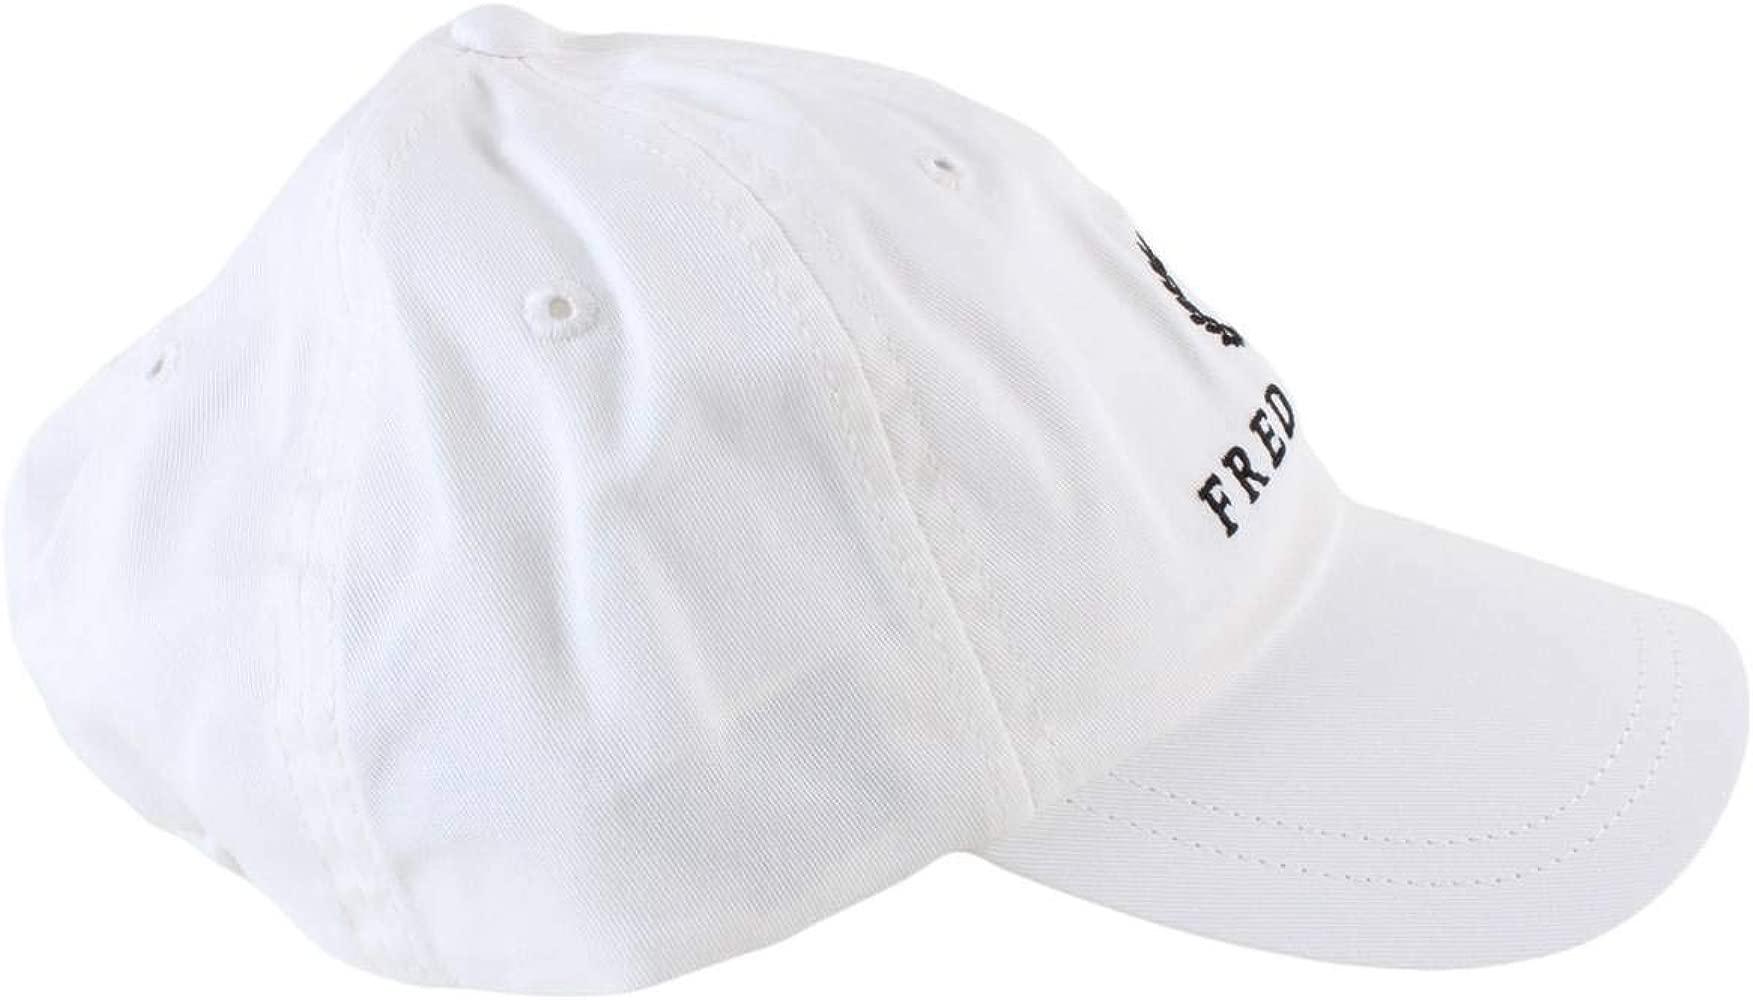 Fred Perry Gorras Tennis Cap Snow White Flexfit: Amazon.es: Ropa y ...